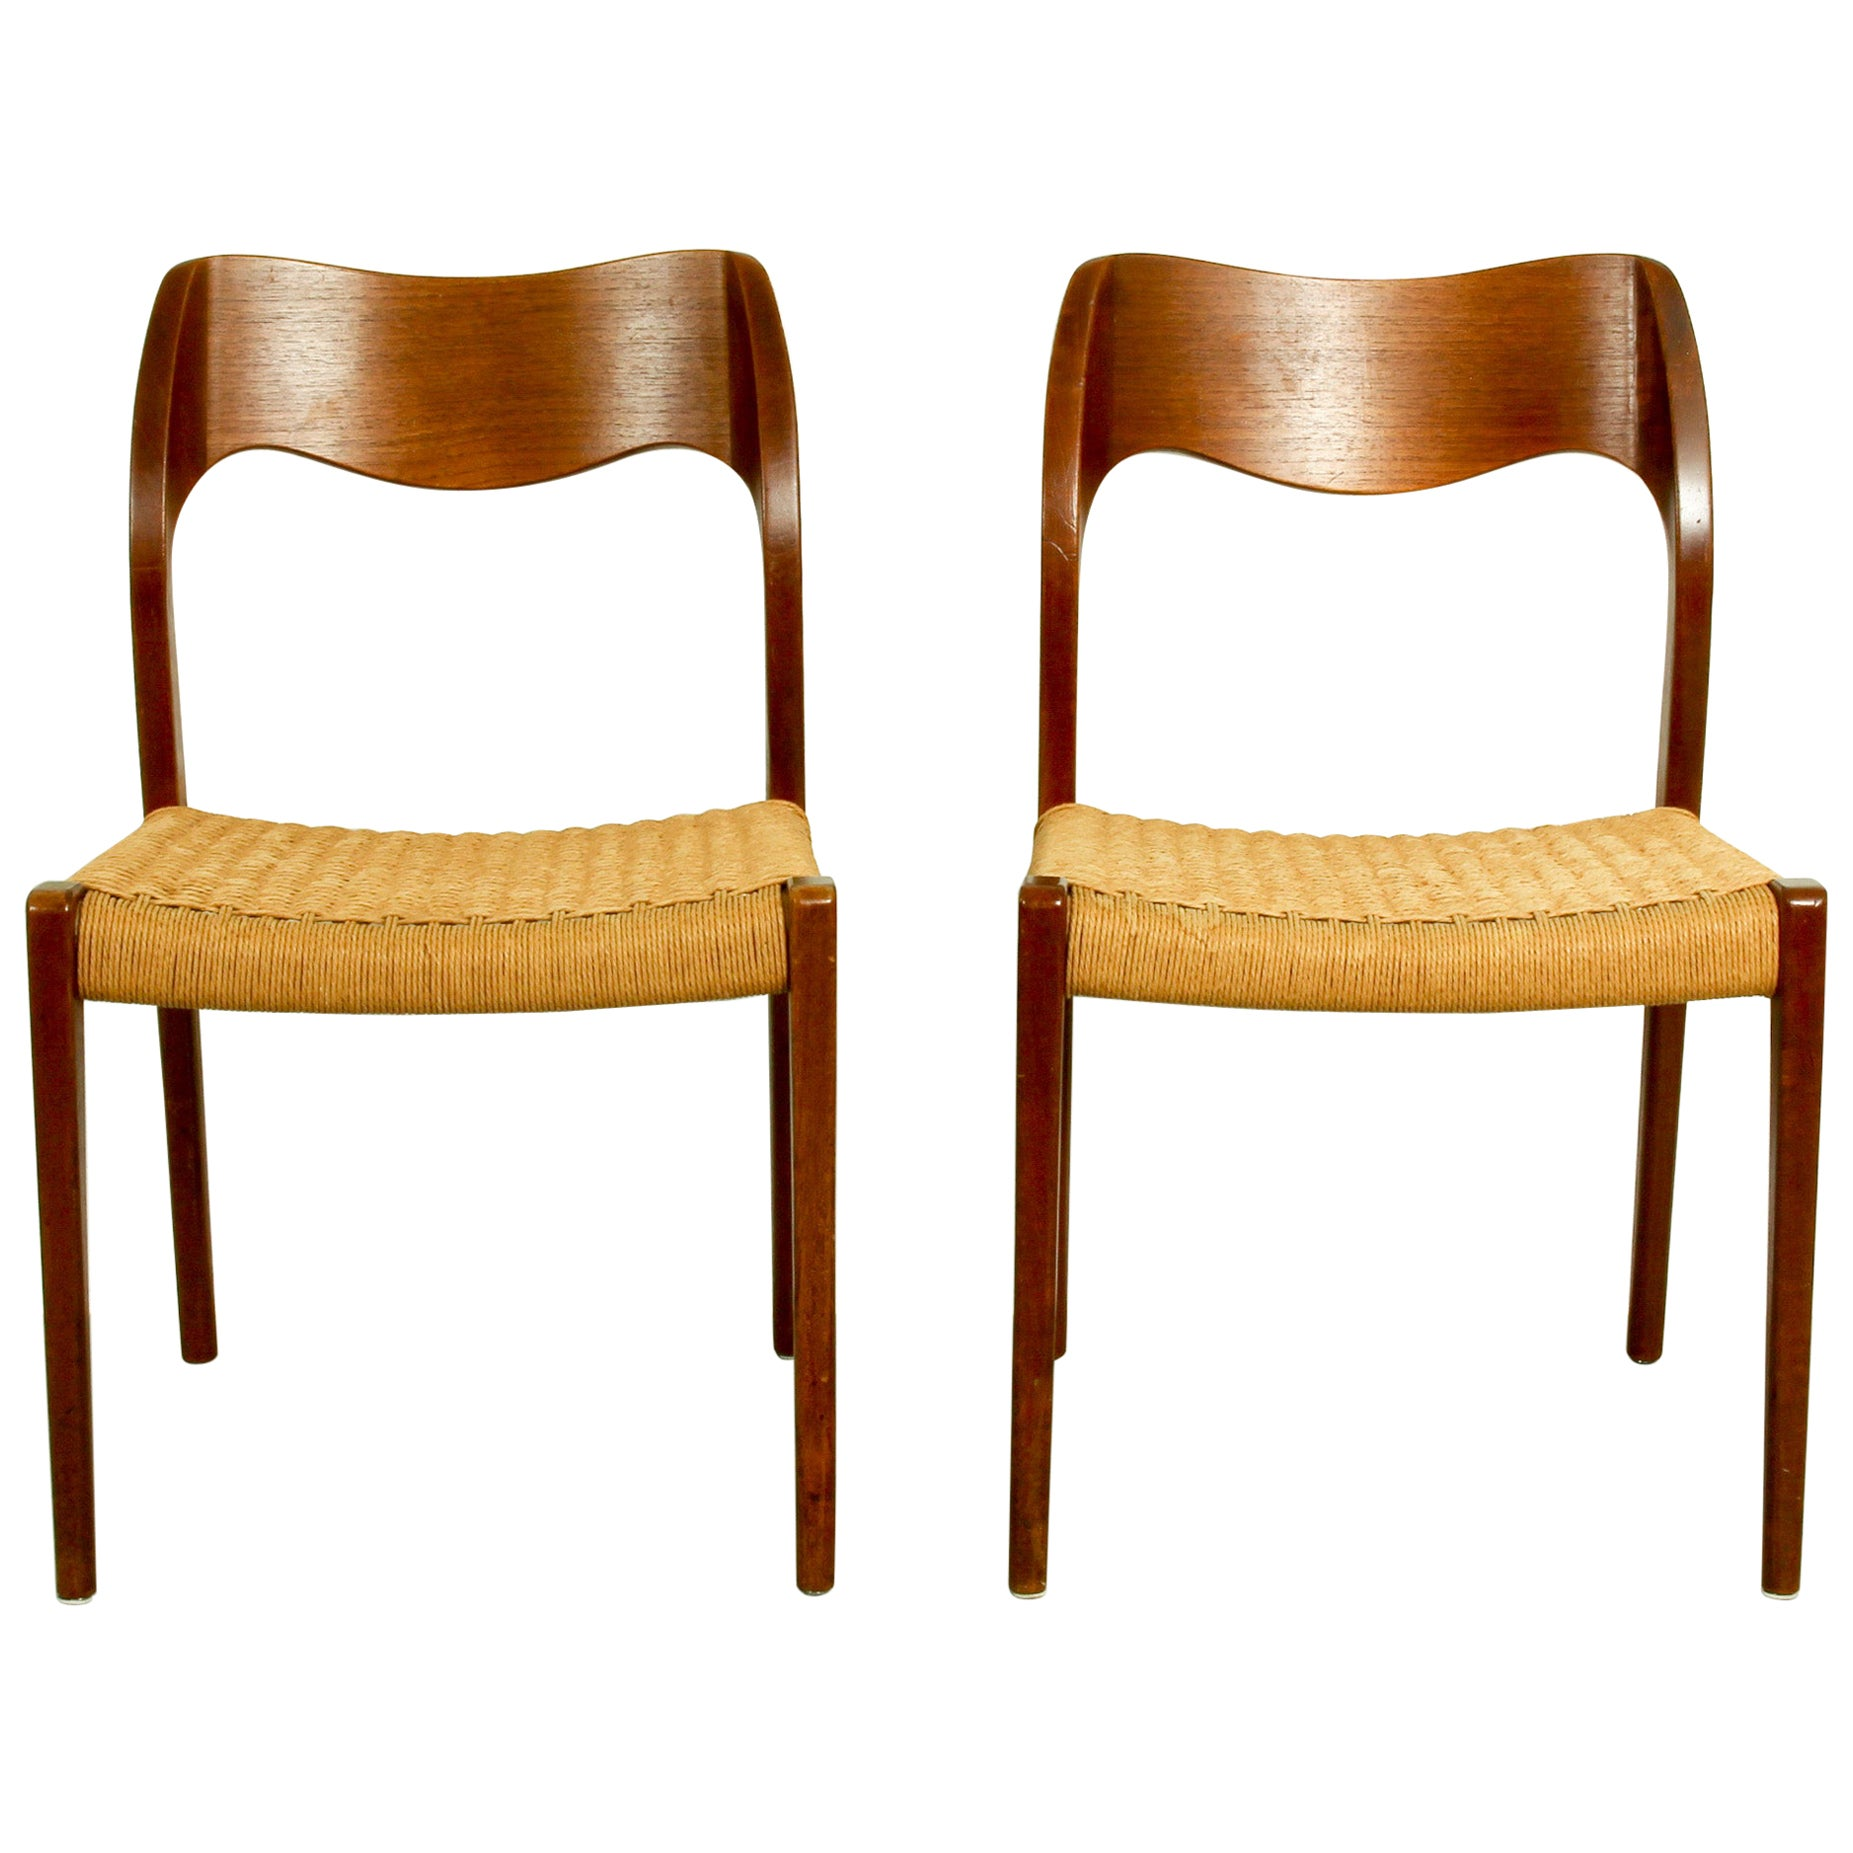 Pair of Teak Model 71 Dining Chairs by Niels Otto Møller for J.L. Møllers, 1950s